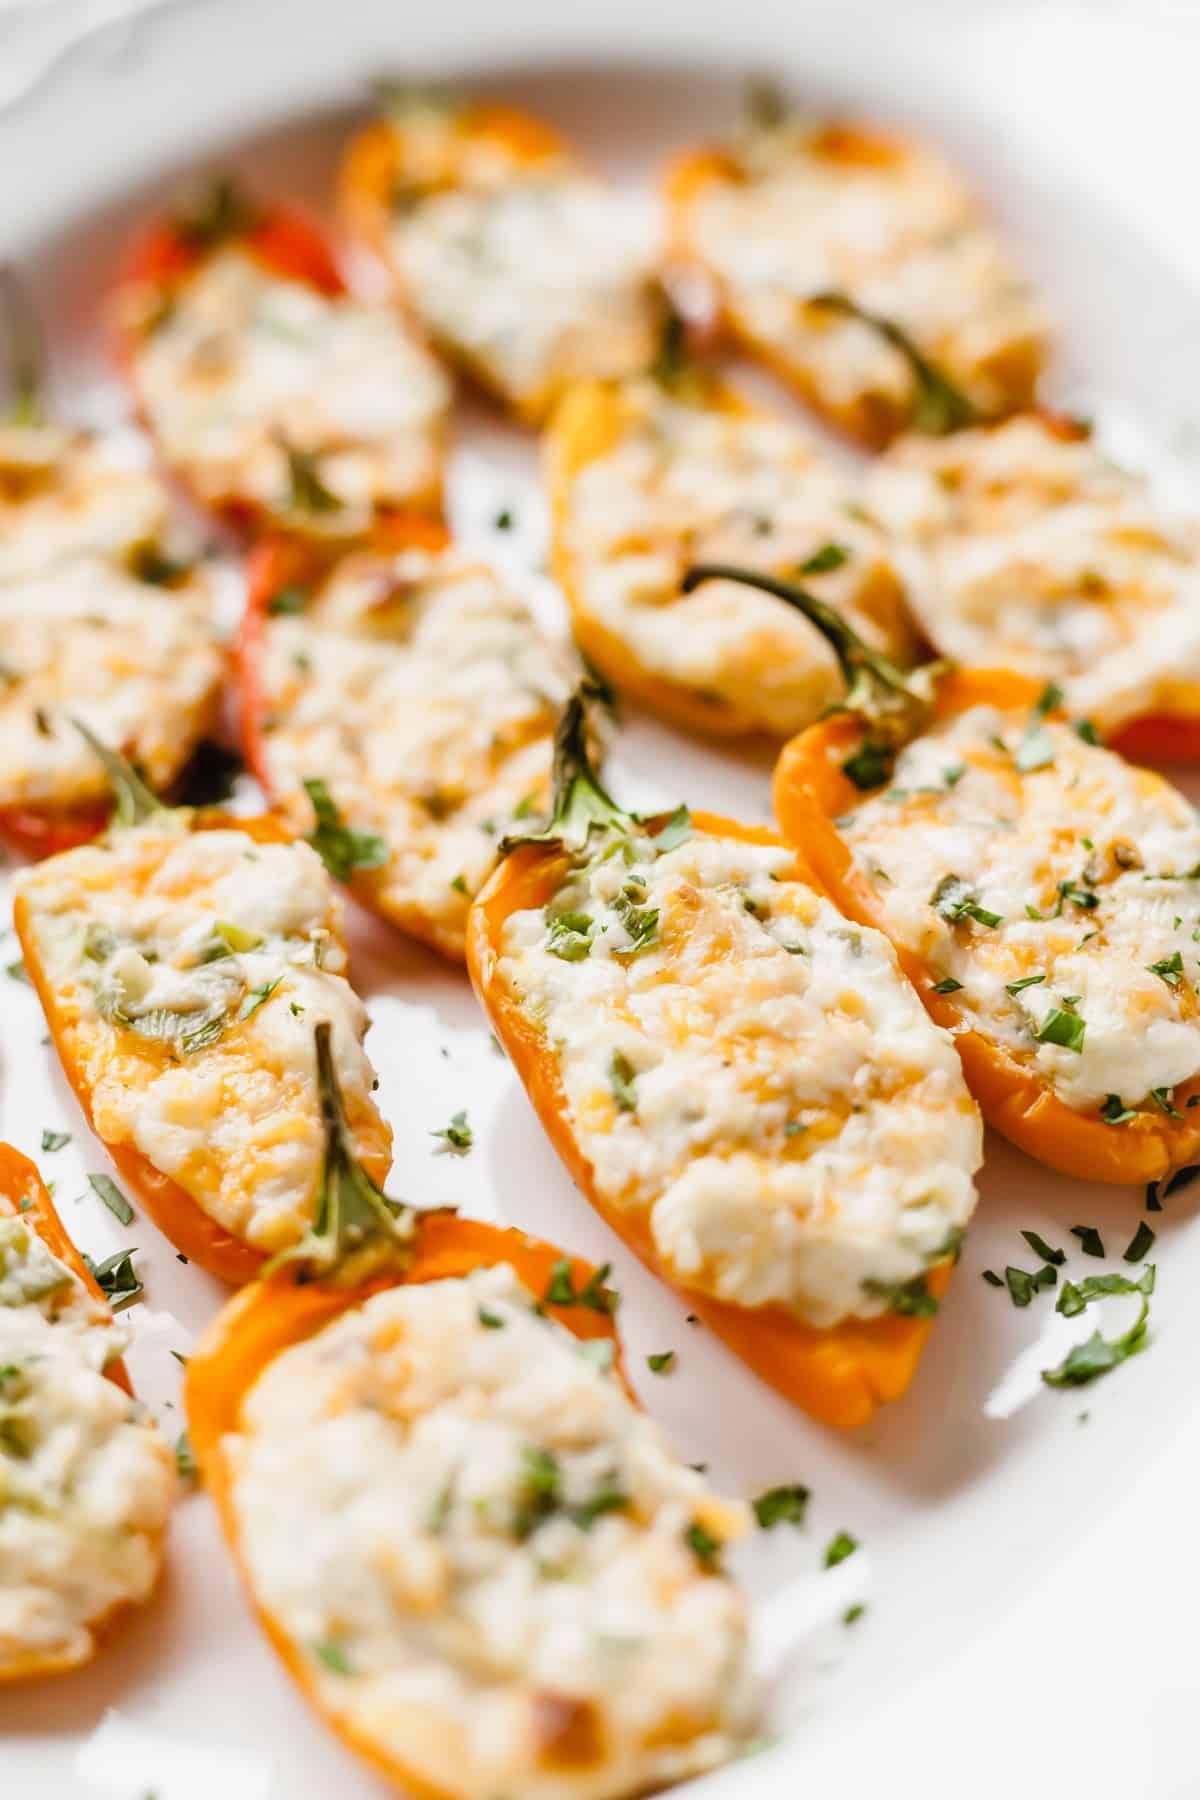 cream cheese stuffed mini peppers on a white plate